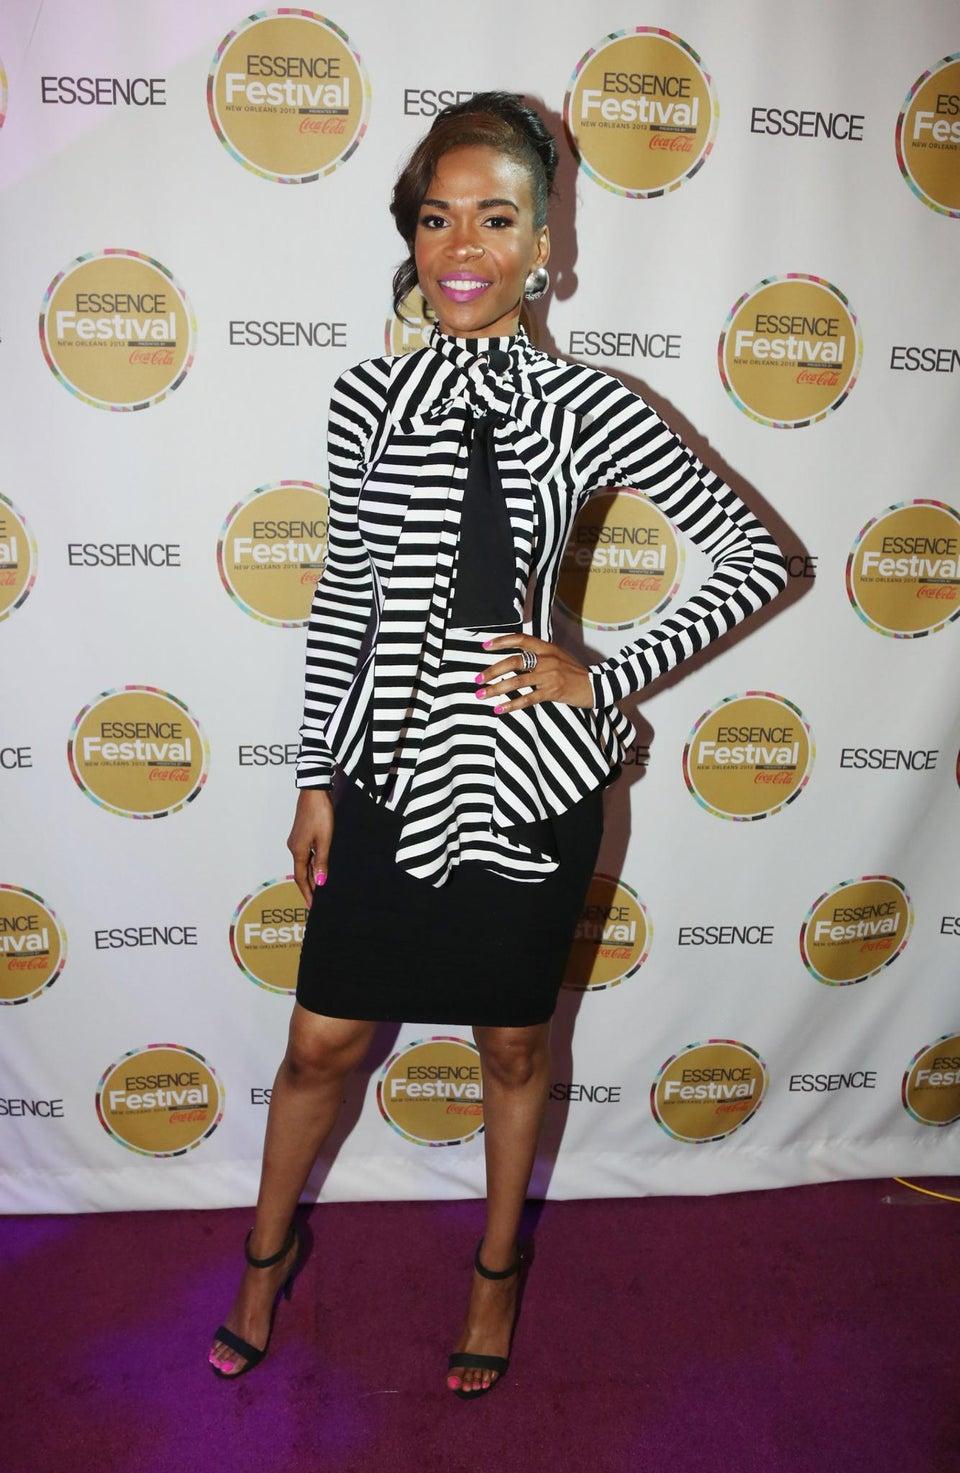 ESSENCE Festival: Watch Michelle Williams Rock the All-Star Gospel Tribute